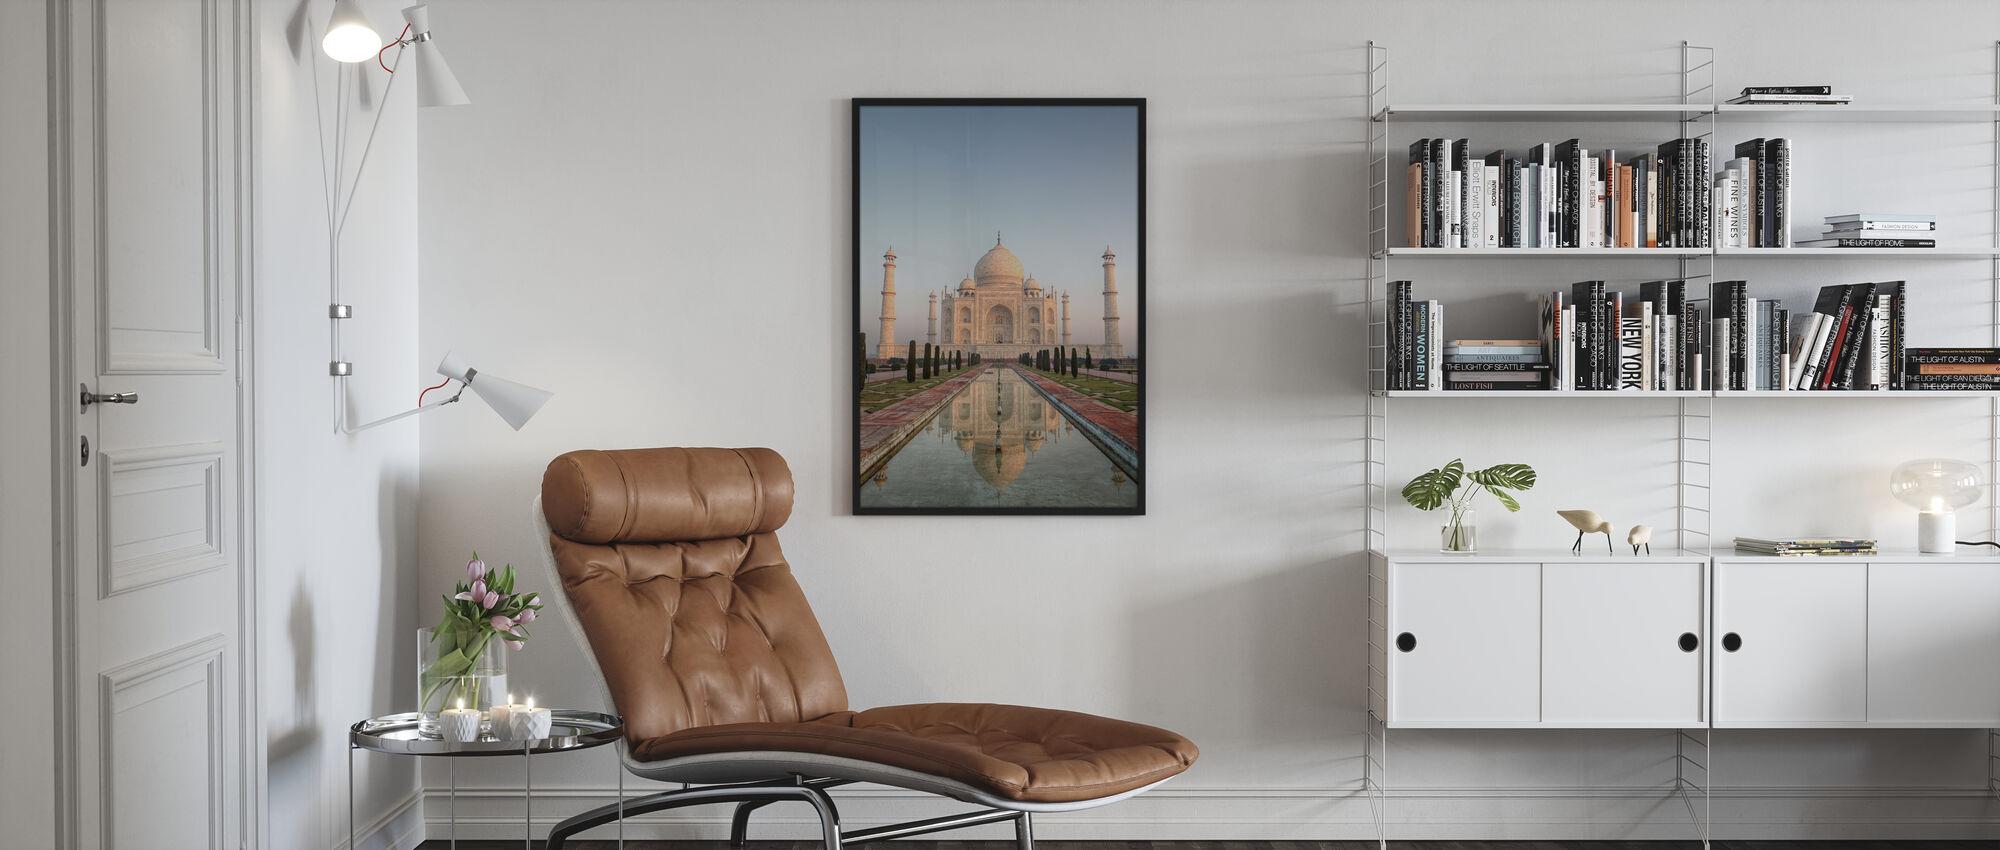 Sunrise at Taj Mahal - Poster - Living Room